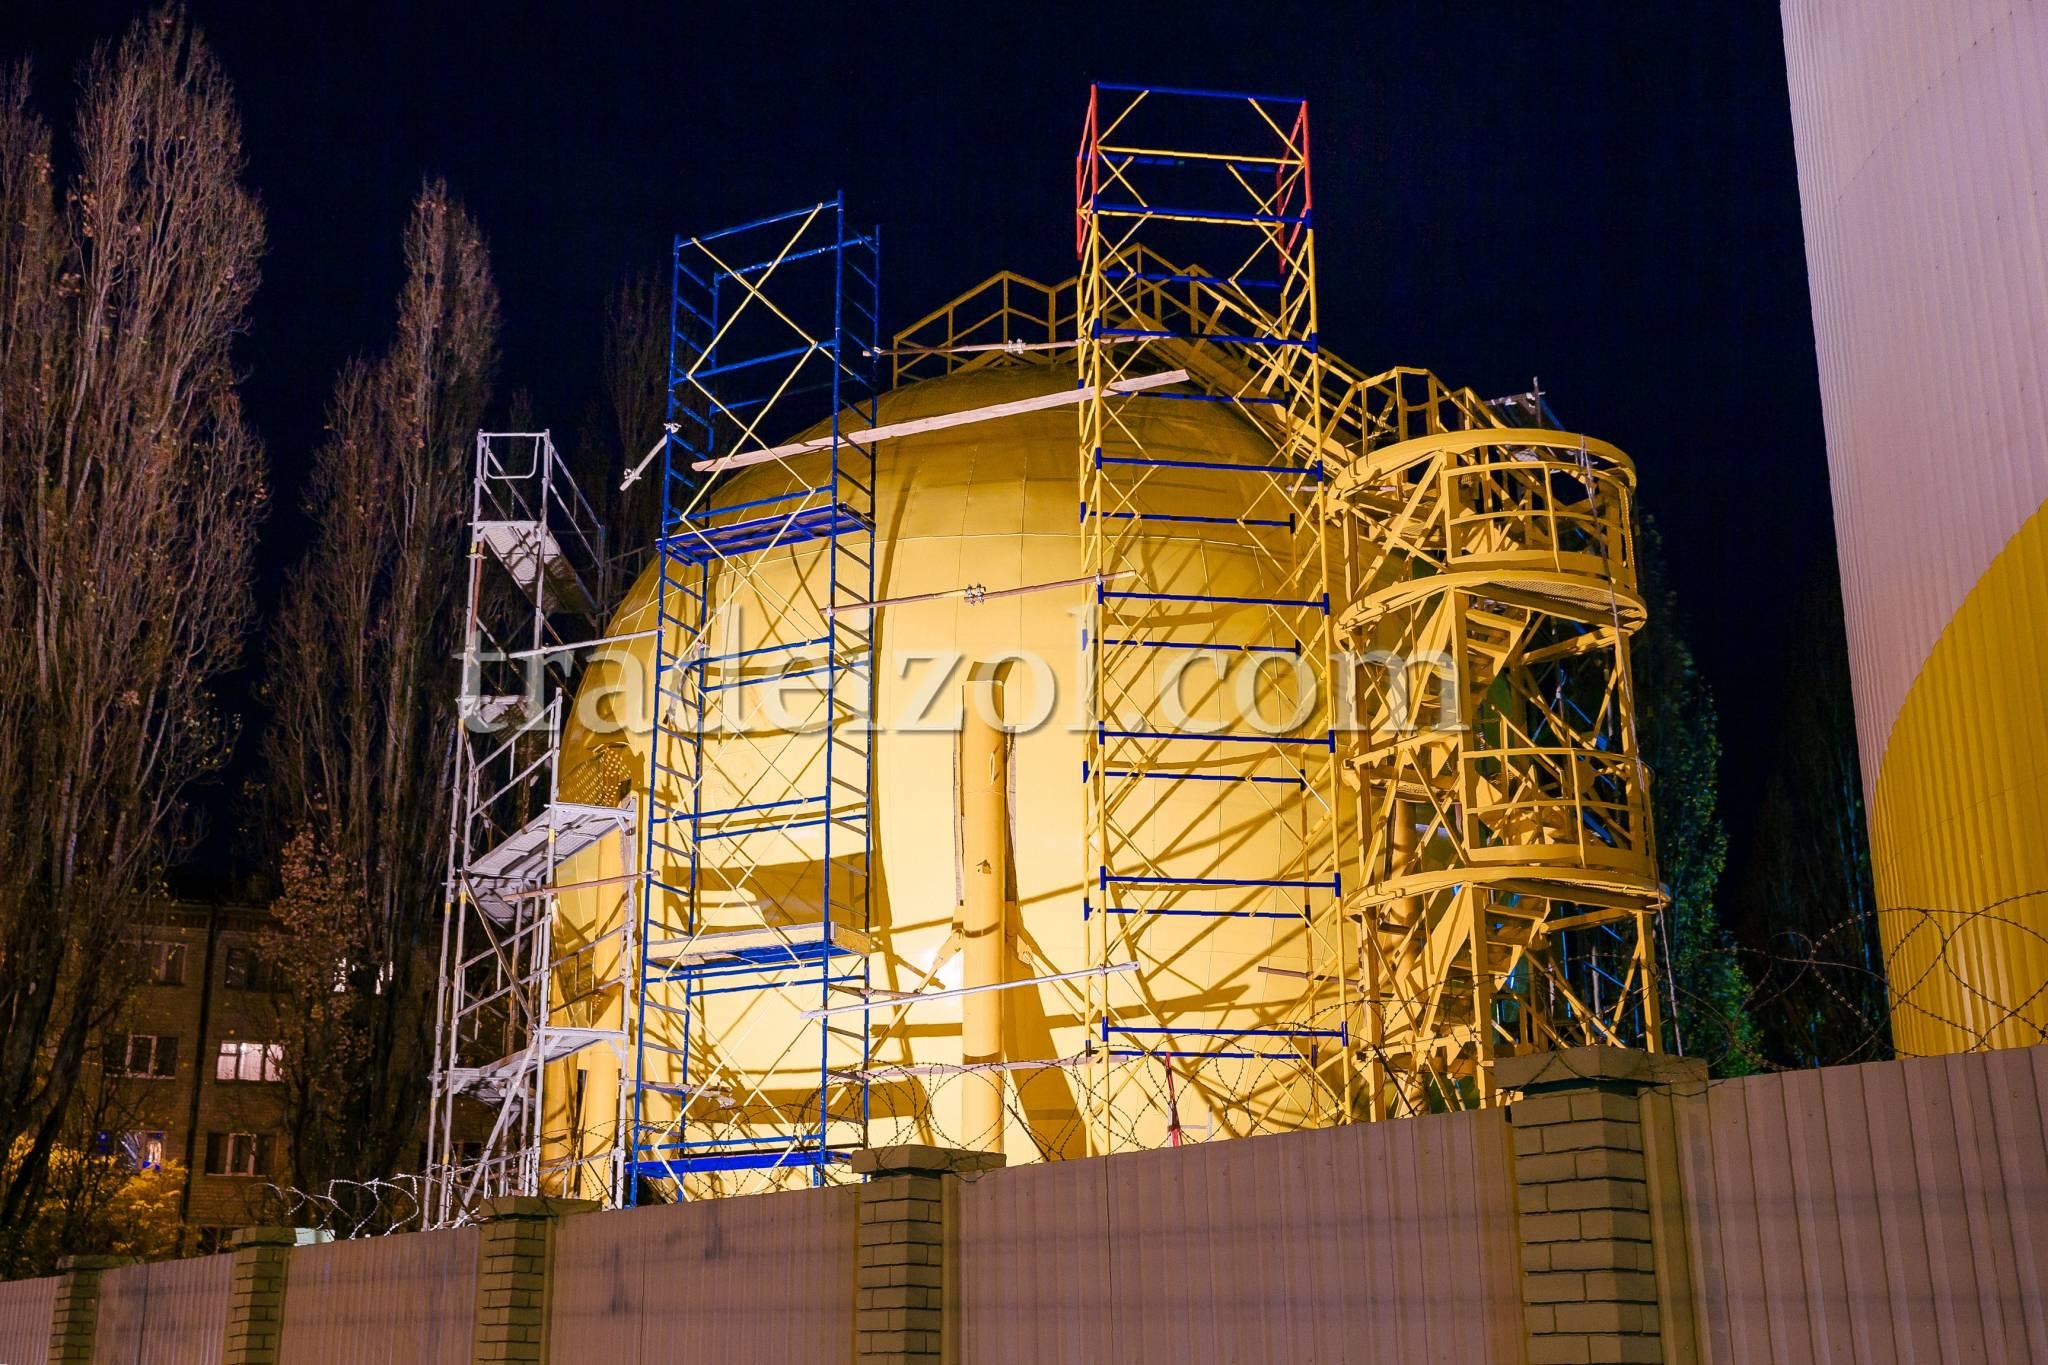 Storage tank's insulation